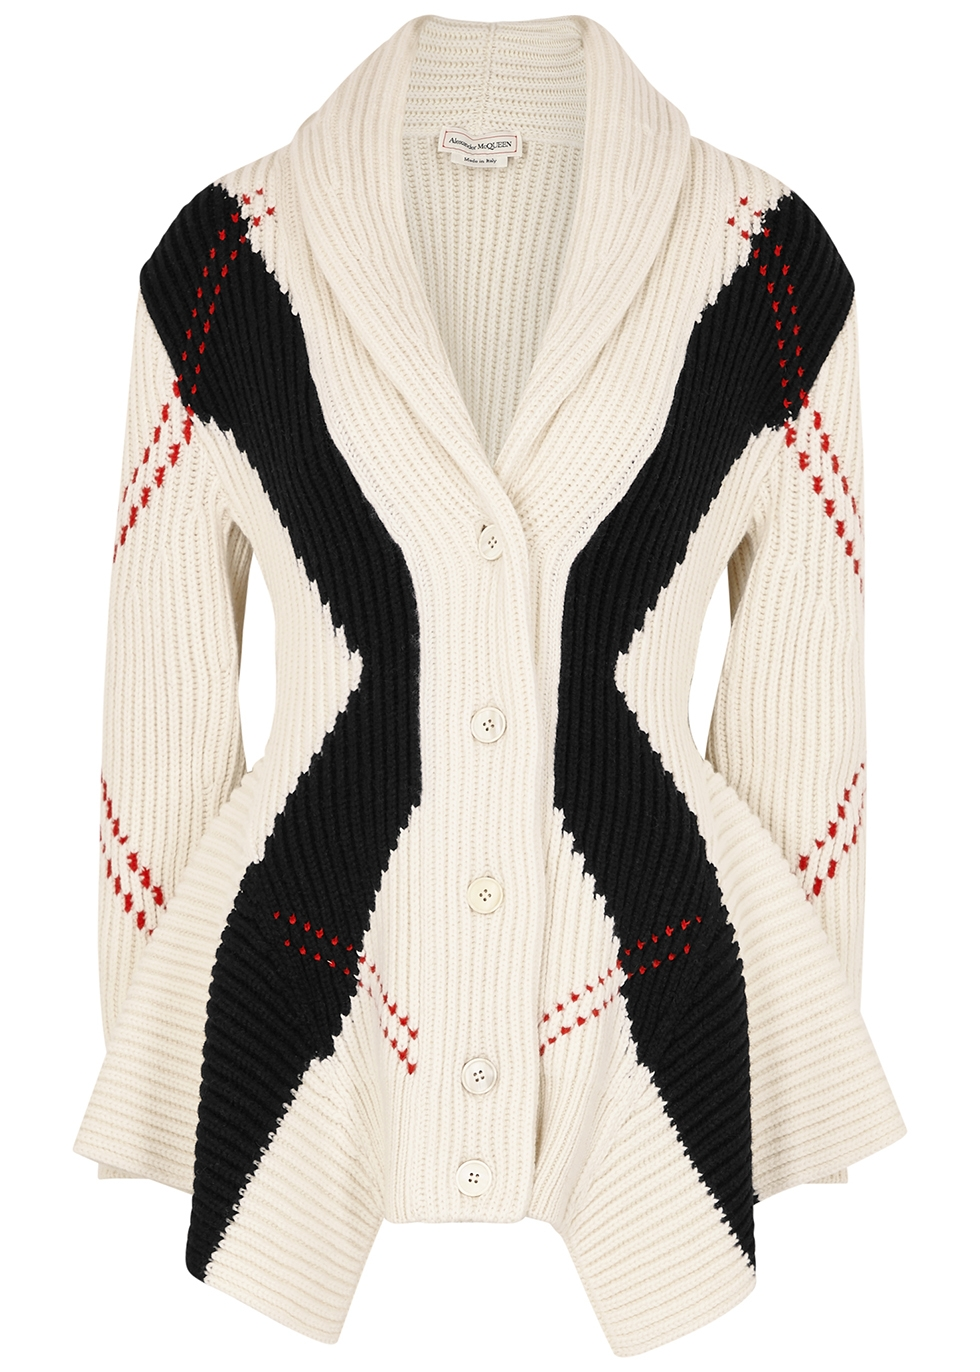 Argyle wool-blend cardigan